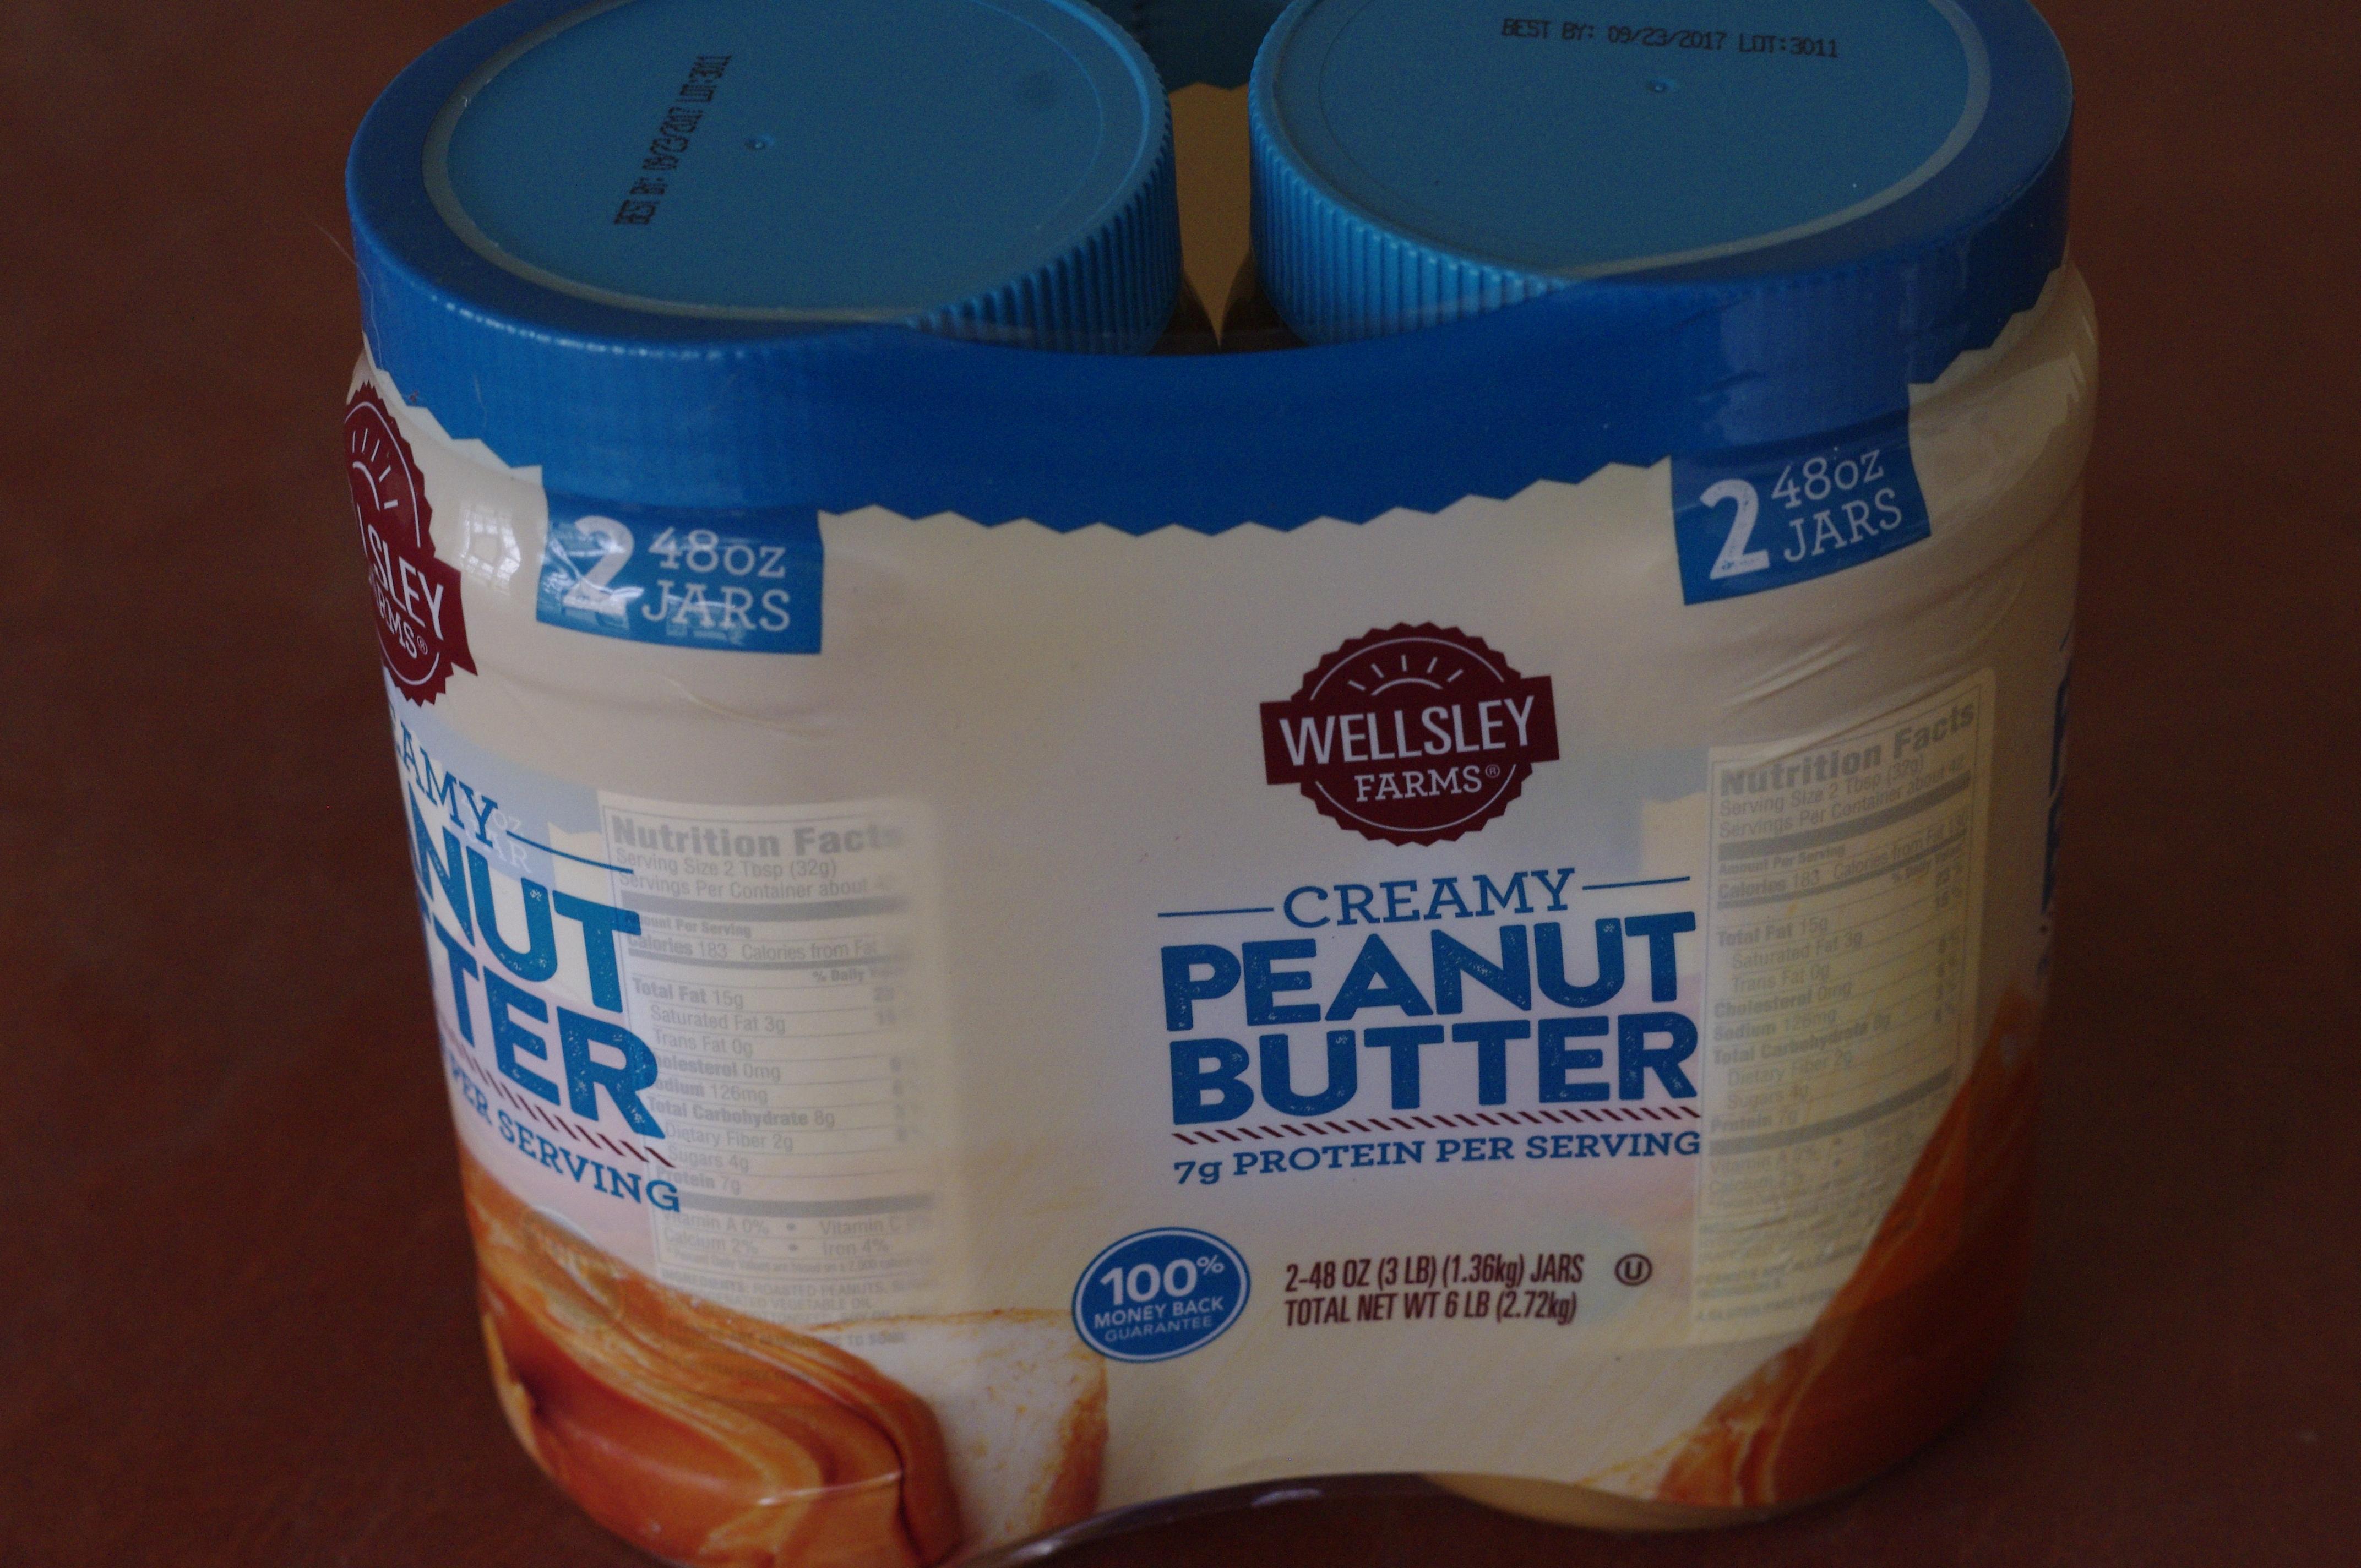 New Wellsley Farms Peanut Butter